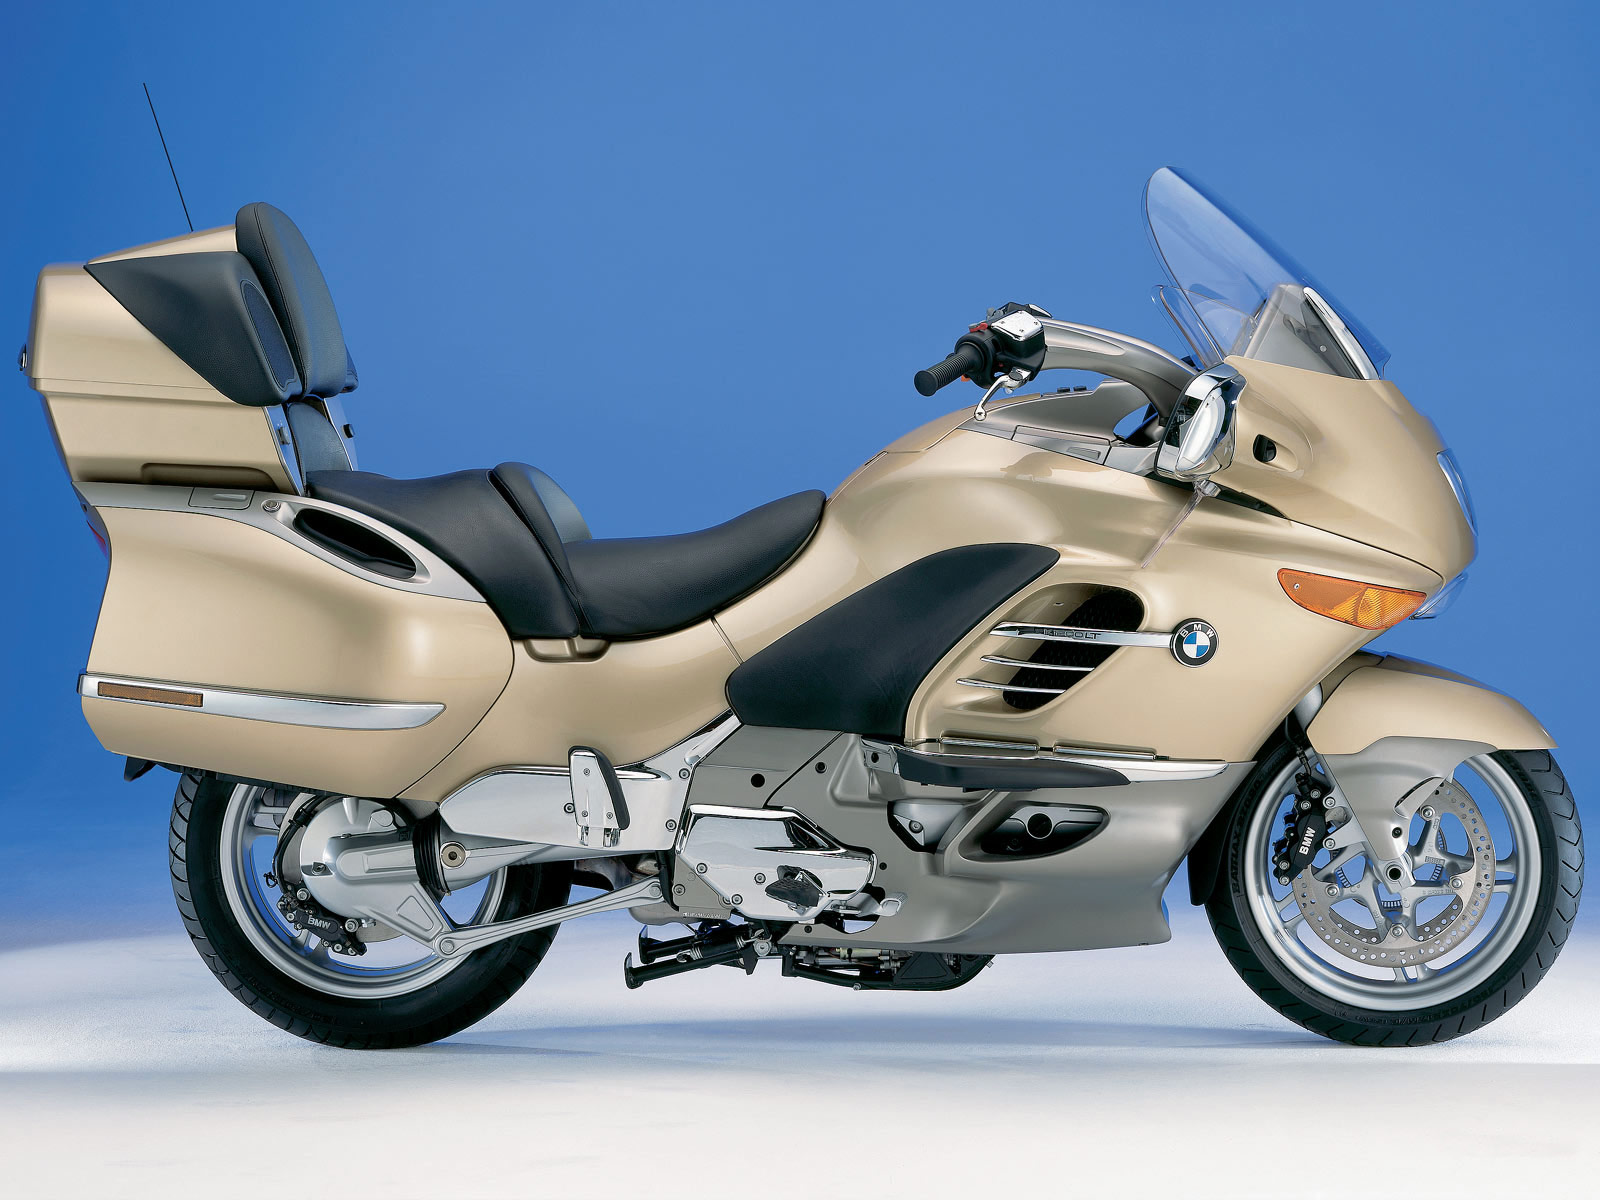 http://3.bp.blogspot.com/-EpX7DyvSjyA/TiOs2xdxwbI/AAAAAAAAAgc/mcYAJYPikYA/s1600/2004_K1200LT_motorcycle-BMW-desktop-wallpapers_6.jpg